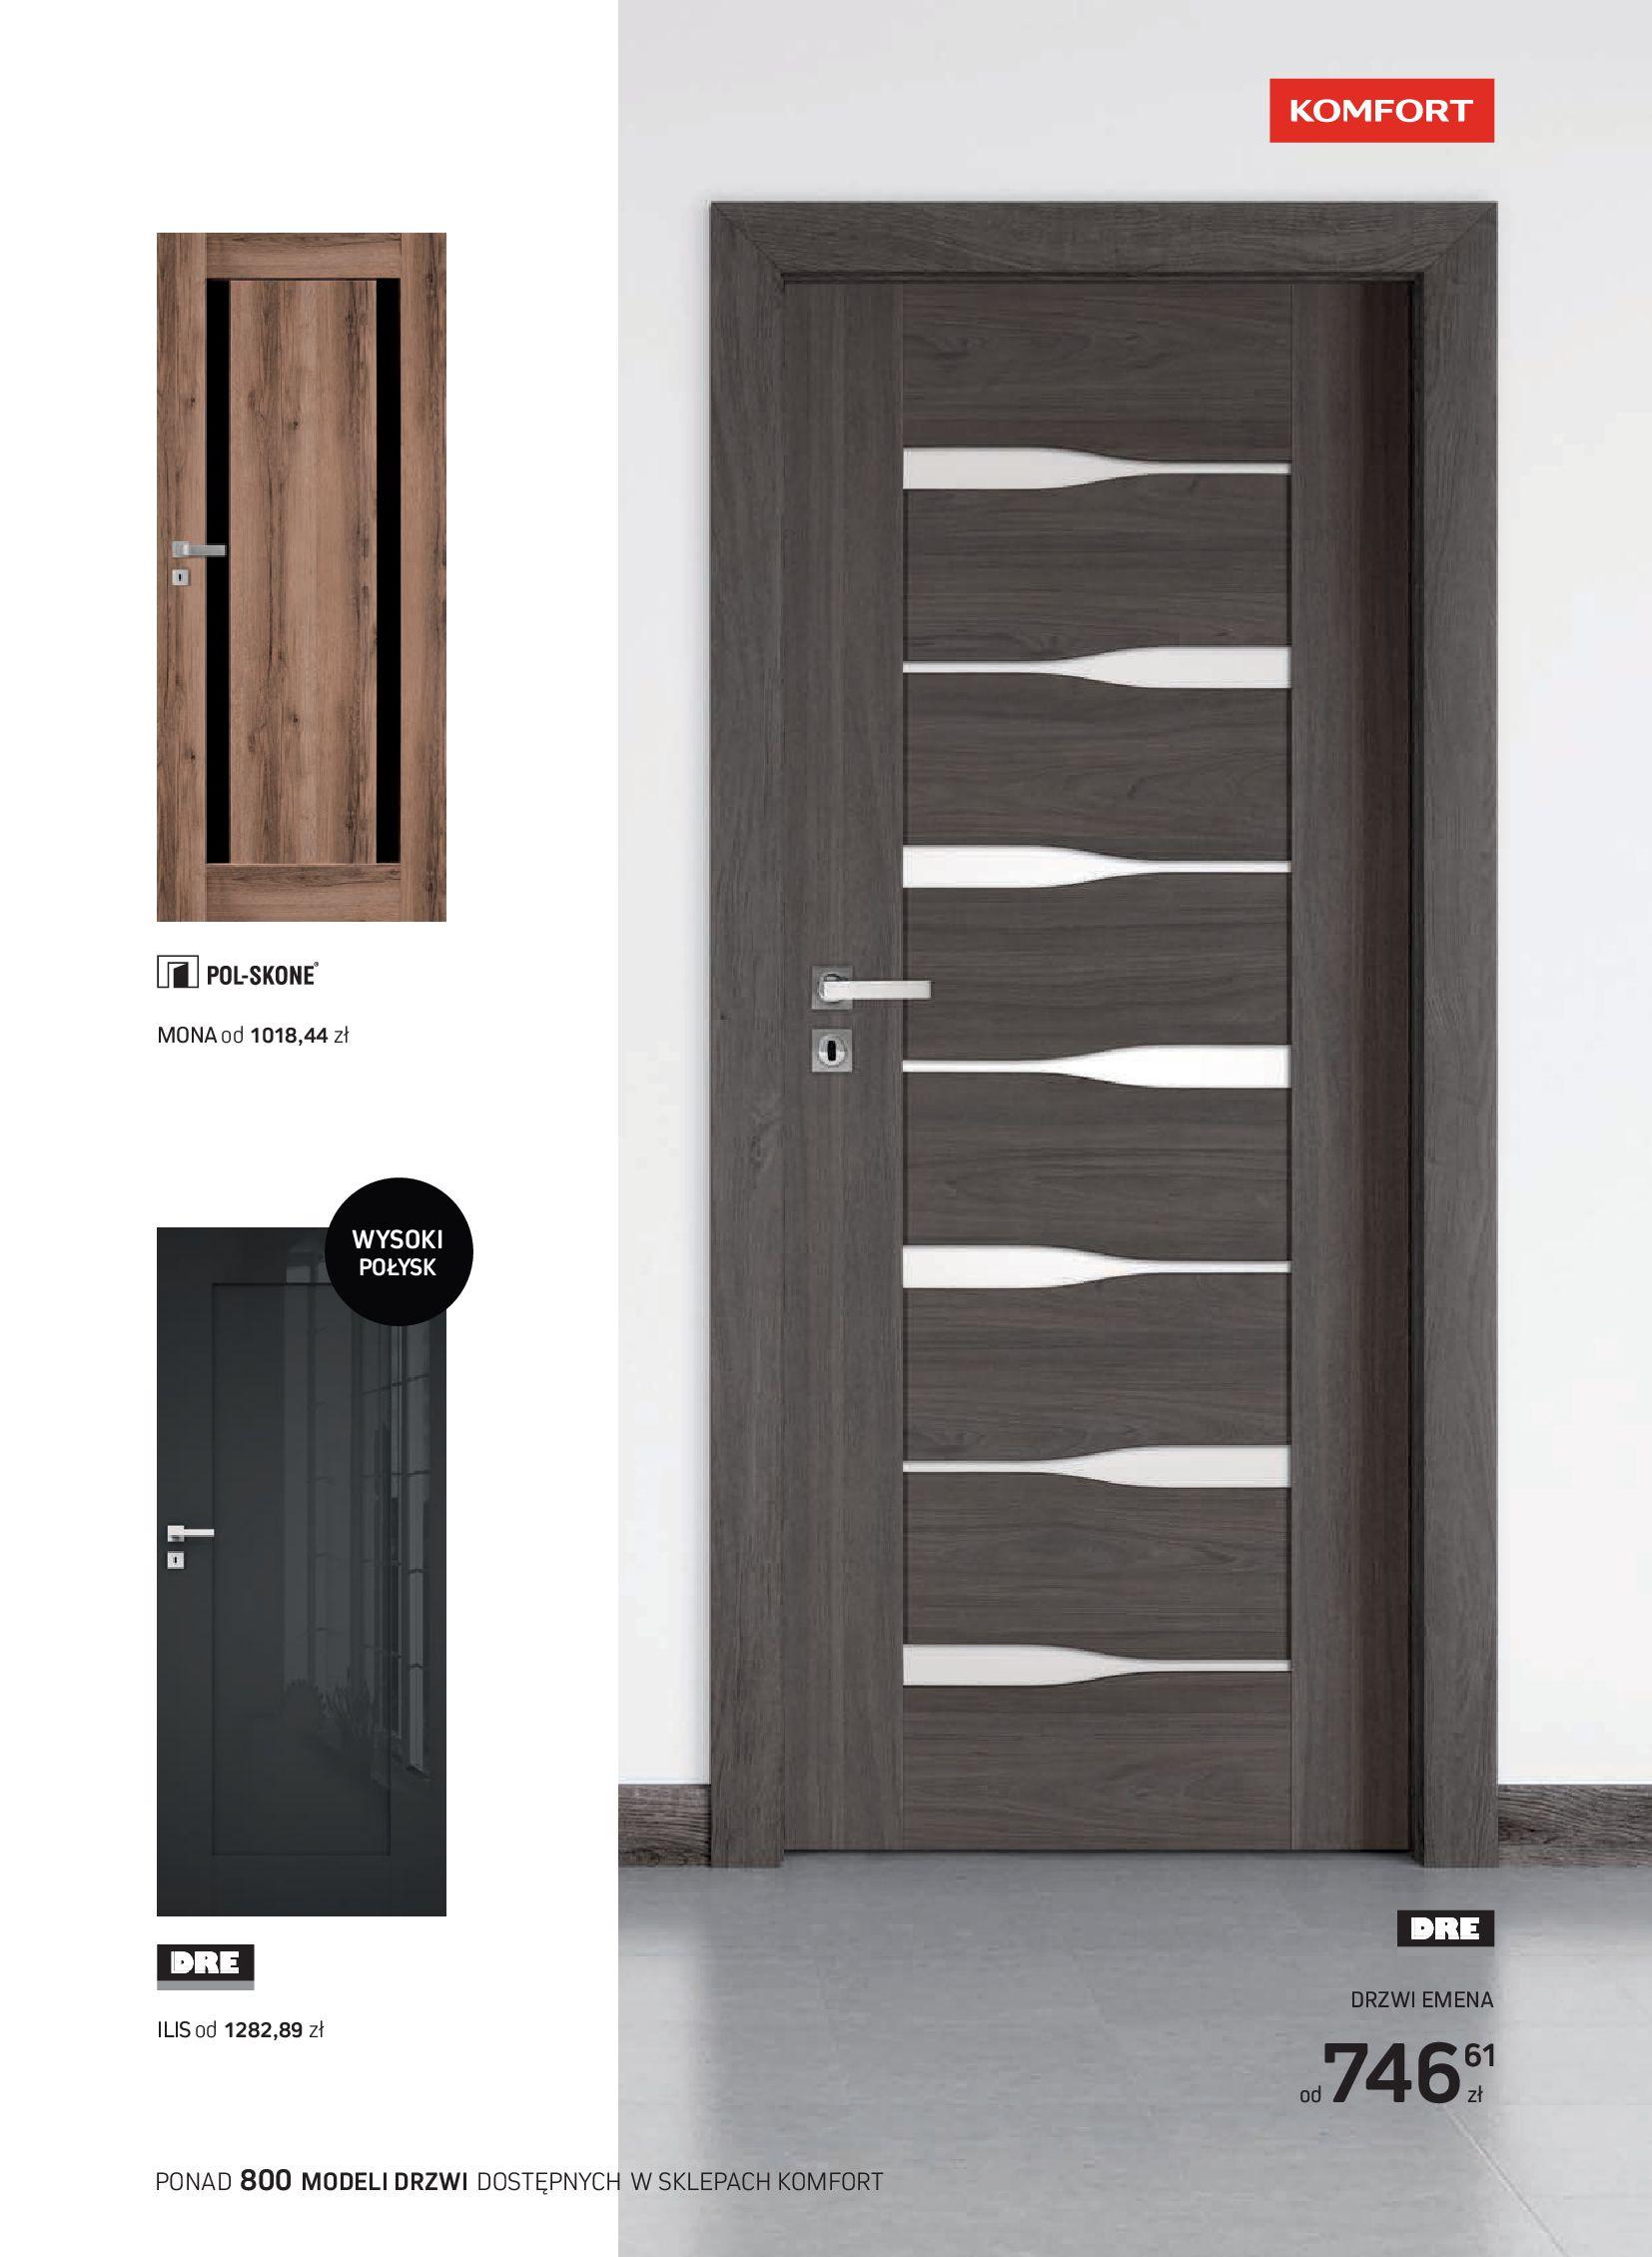 Gazetka Komfort: Gazetka Komfort - Katalog podłogi i drzwi 2021-06-16 page-59